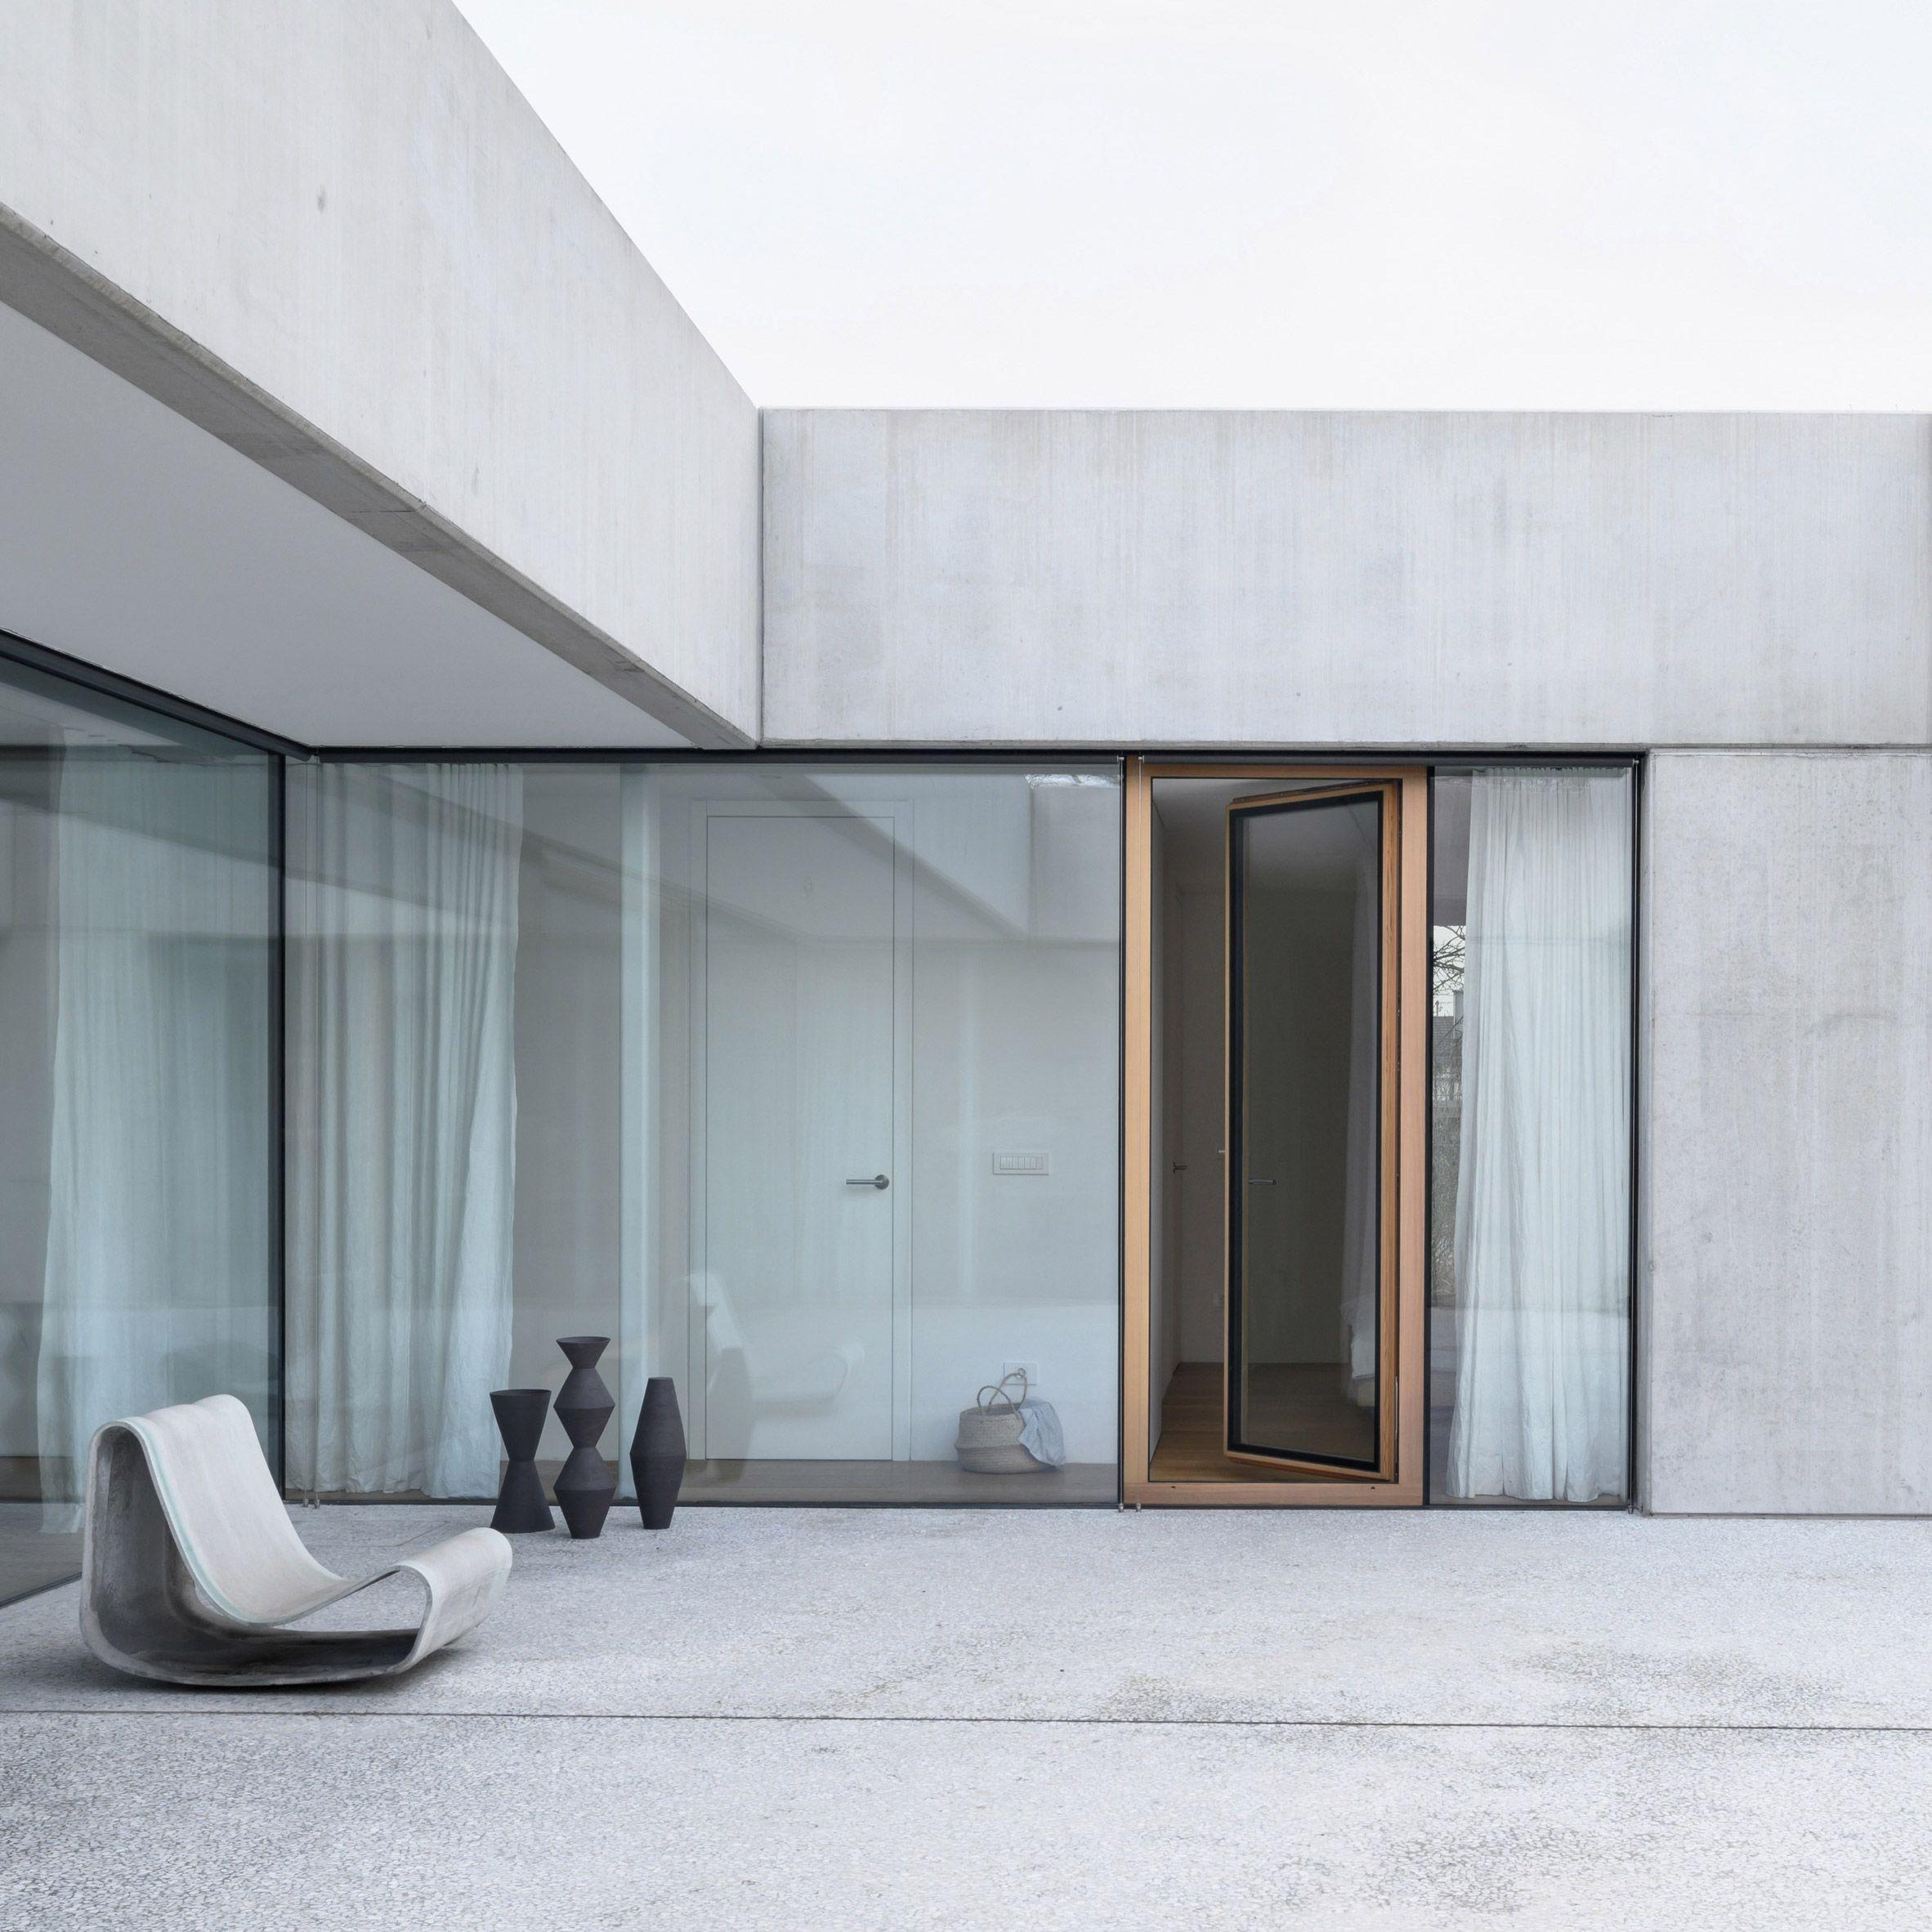 Concrete Home In Slovenia Combines Living Spaces With A Ceramics Studio In 2020 Concrete Design Wall Exterior Concrete House